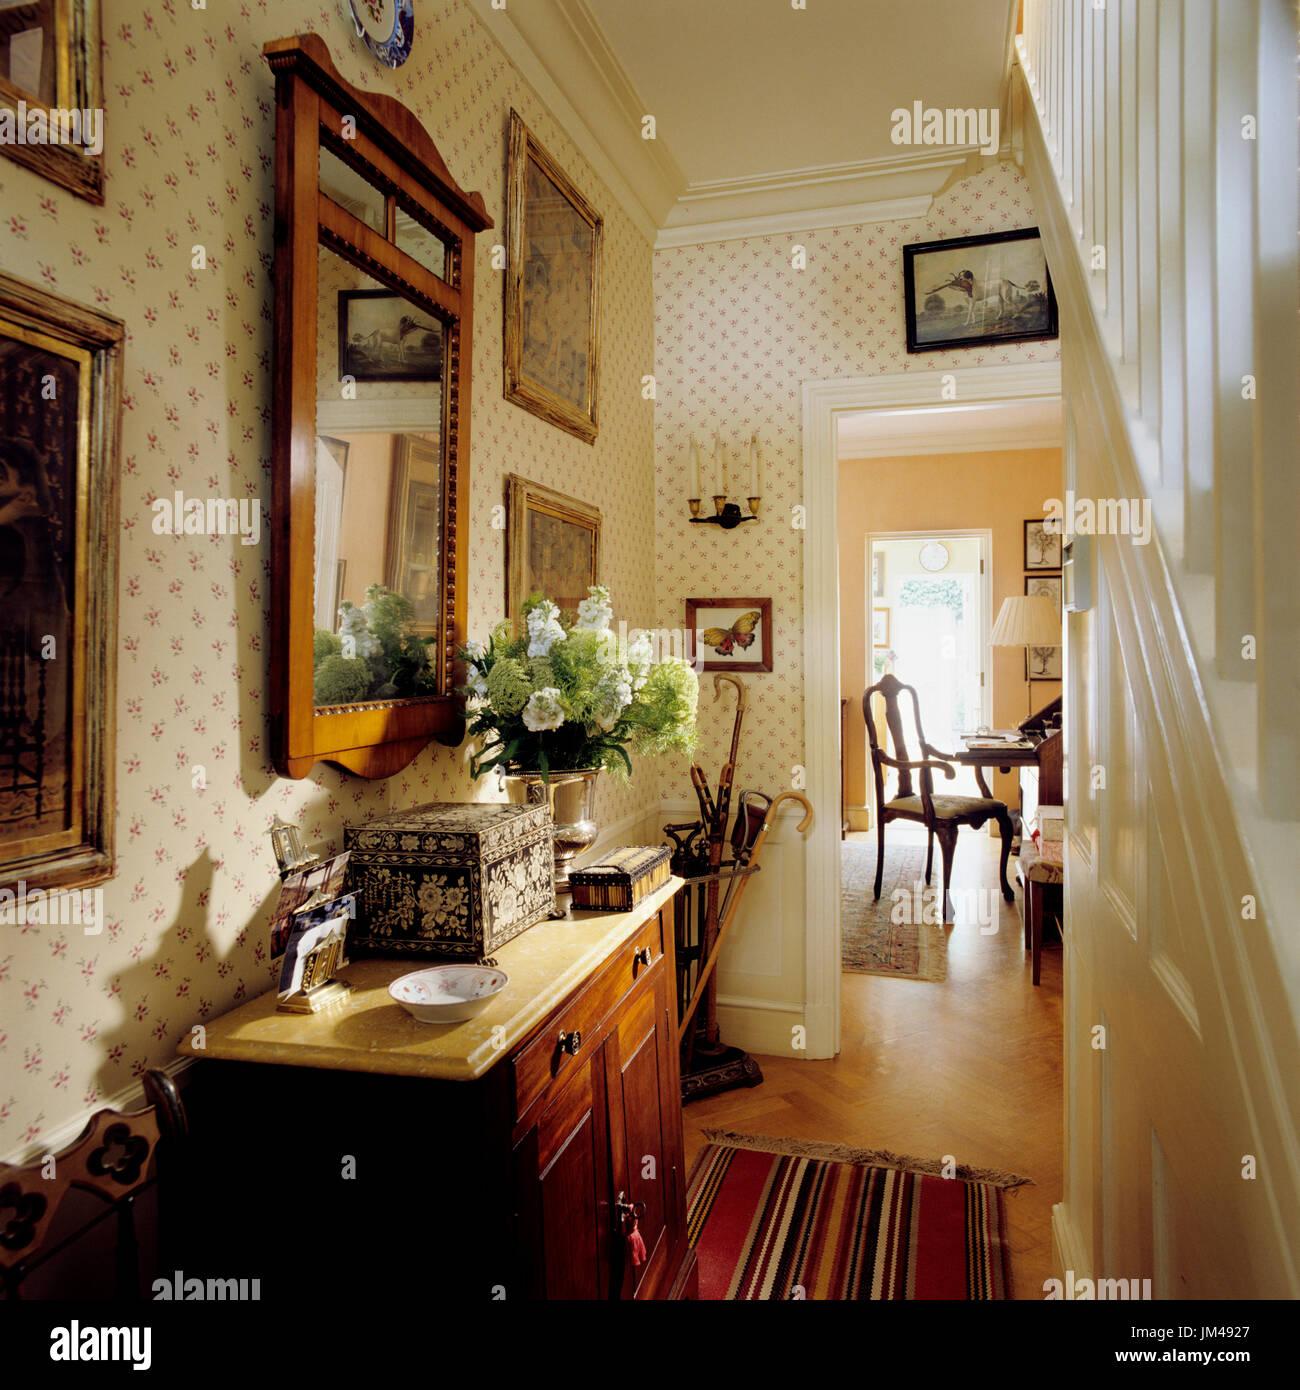 hallway home mirror stockfotos hallway home mirror bilder alamy. Black Bedroom Furniture Sets. Home Design Ideas